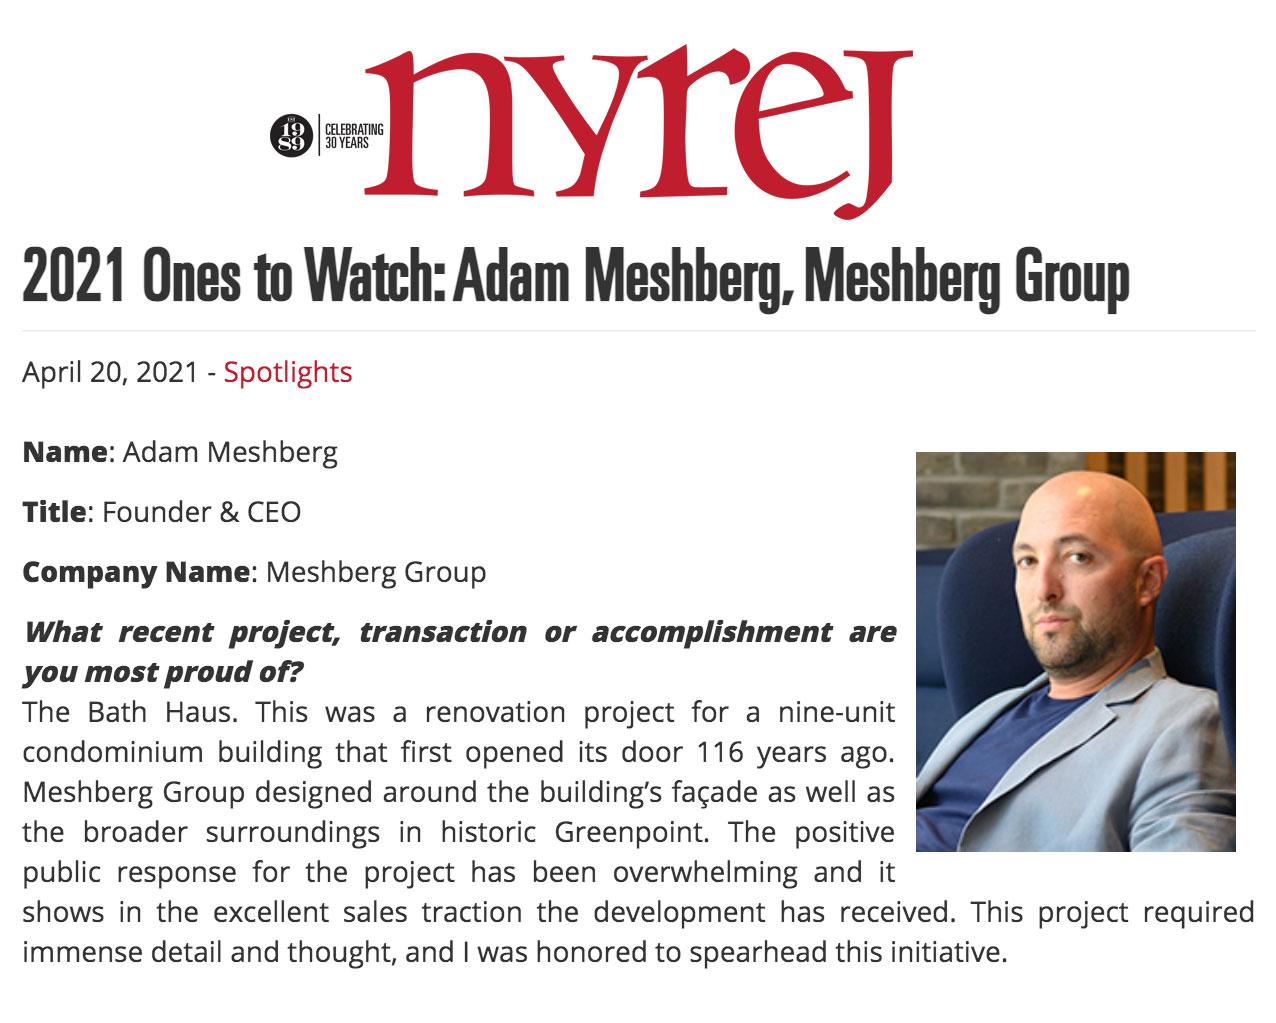 New York Real Estate Journal: 2021 Ones to Watch: Adam Meshberg, Meshberg Group